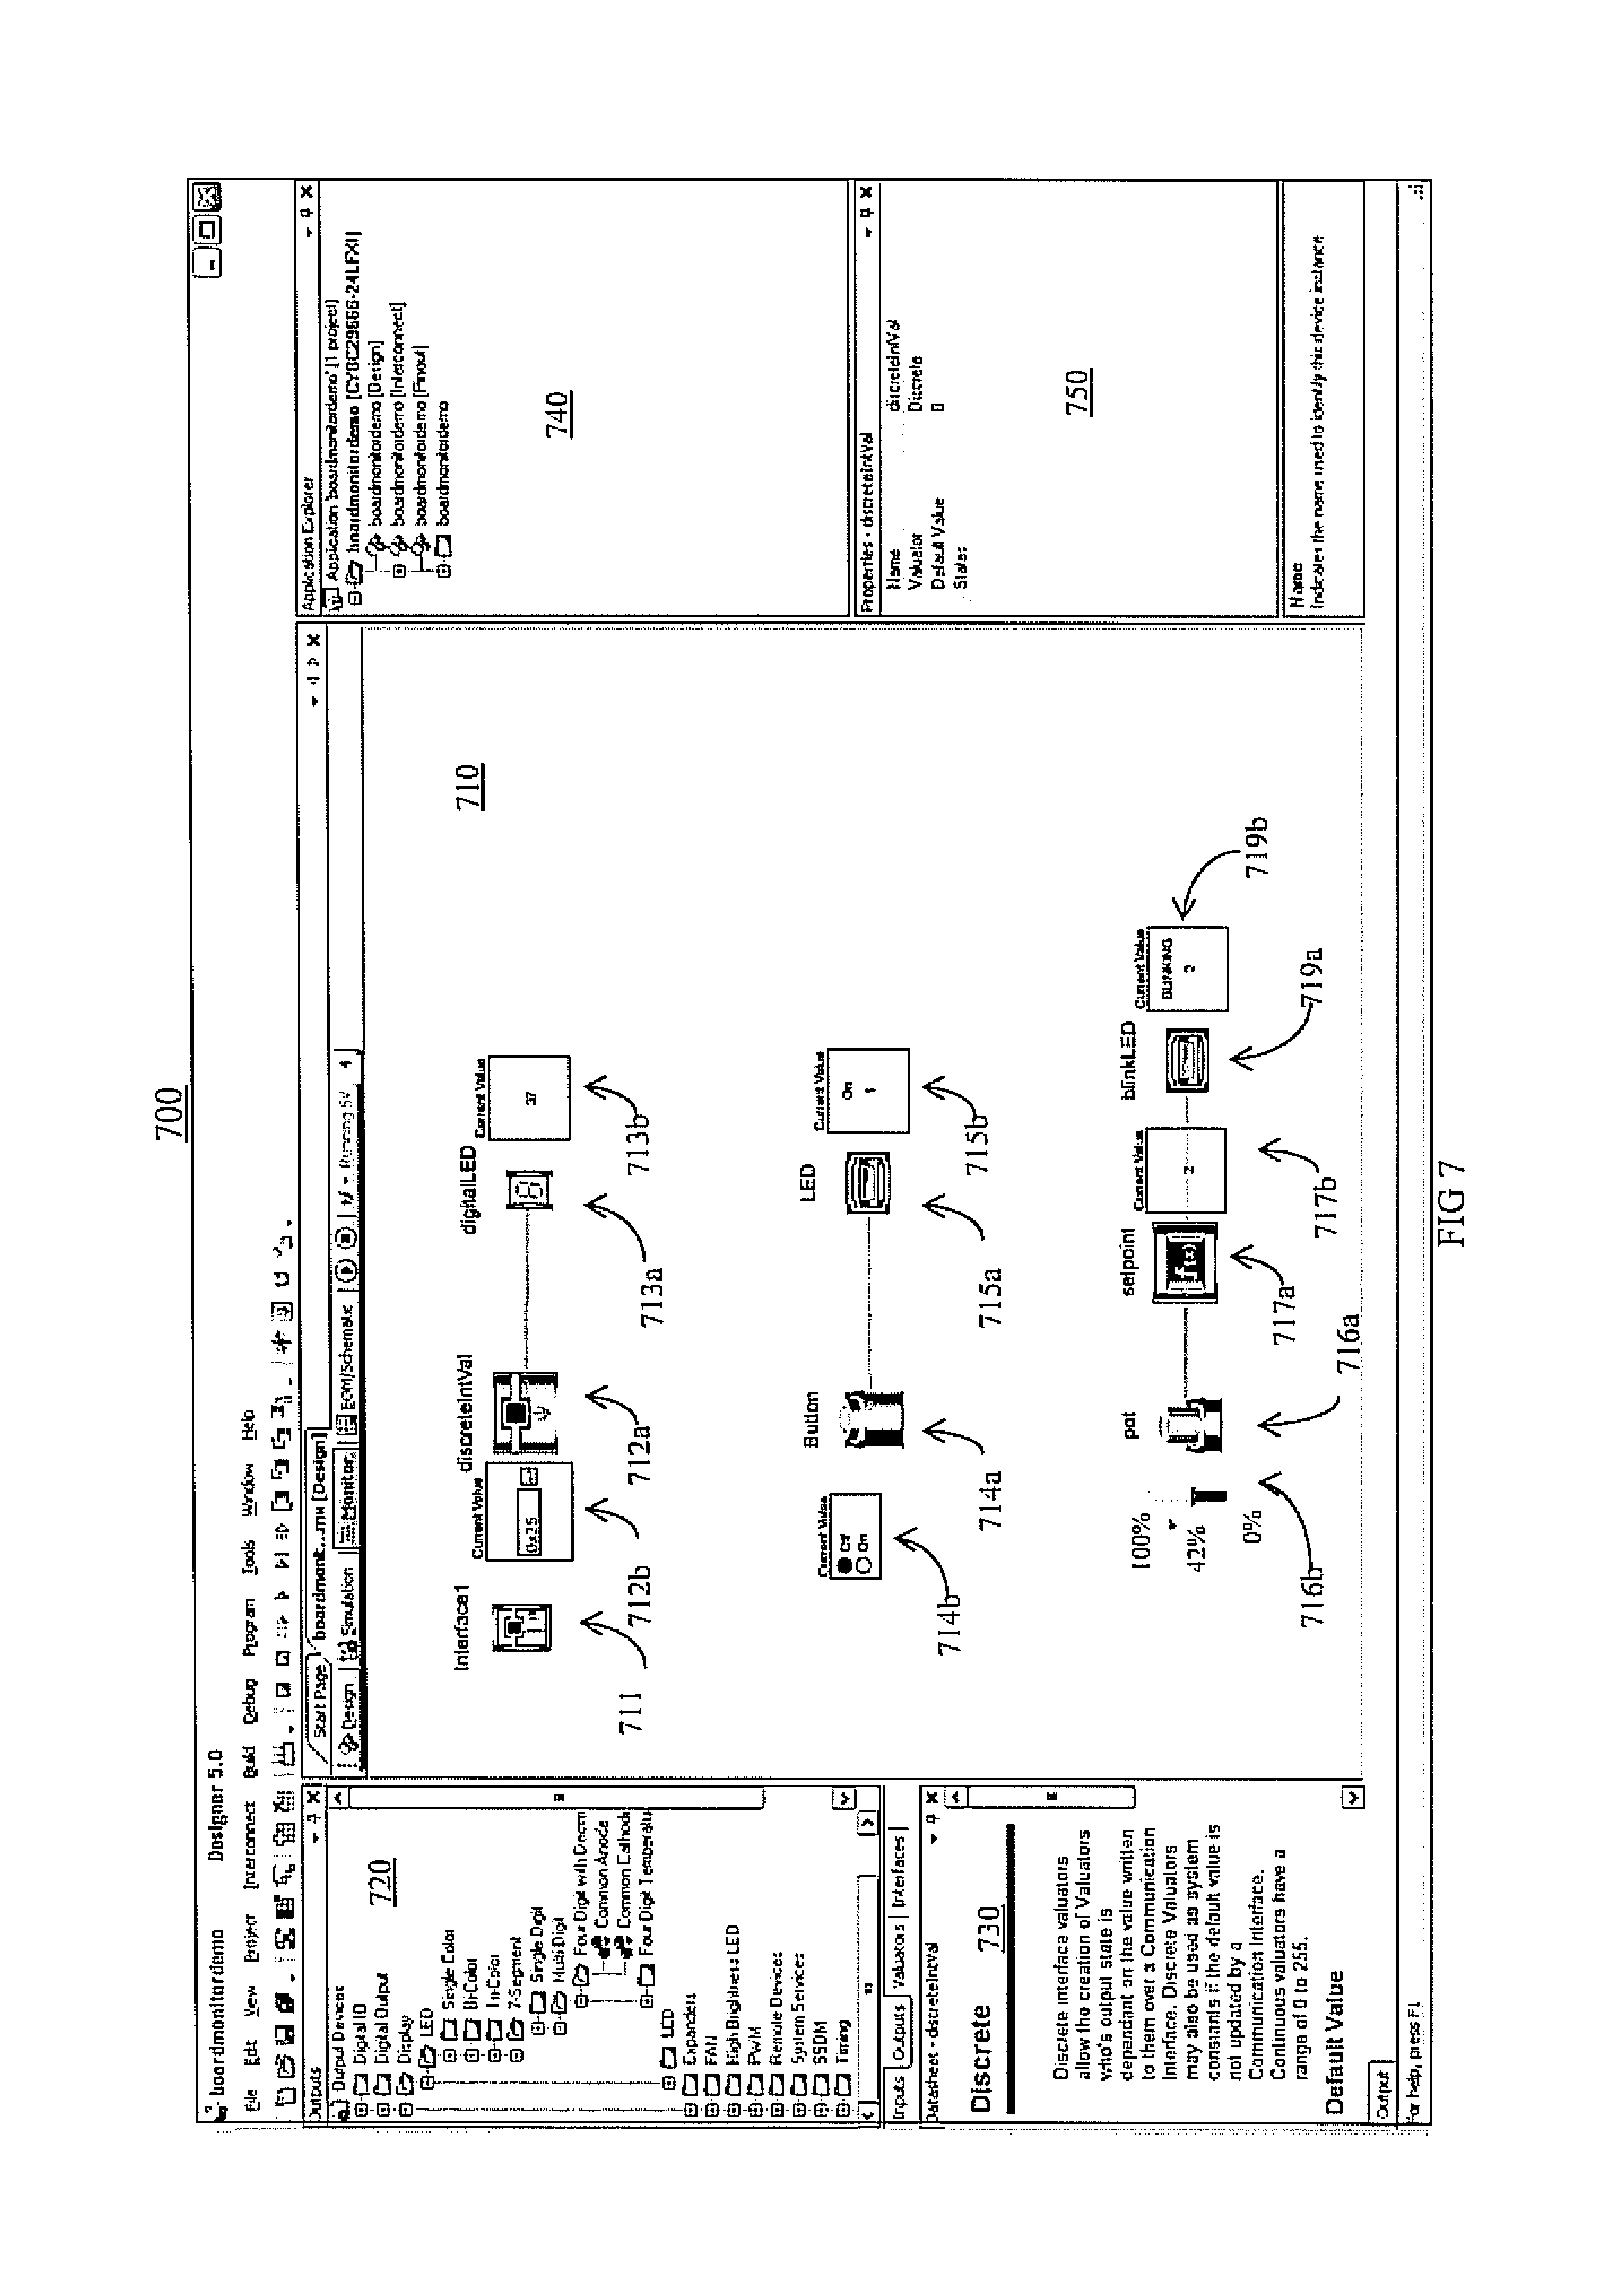 patent us 9720805 b1